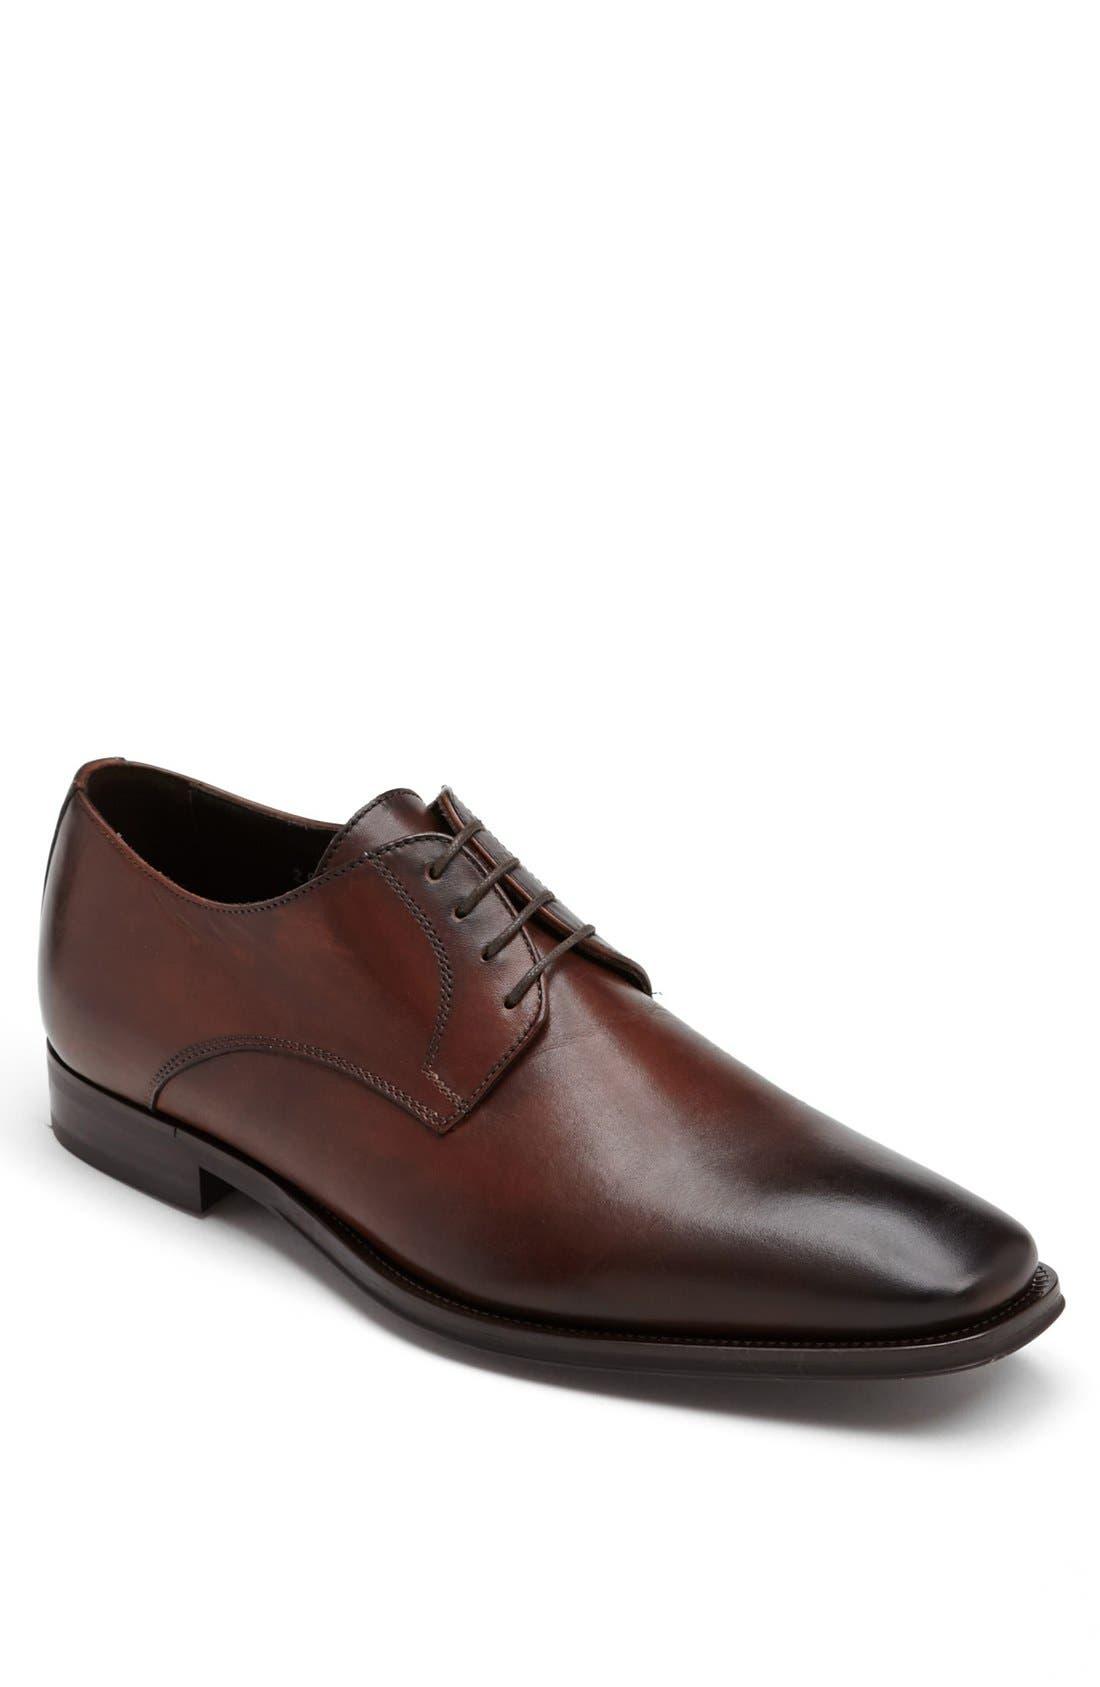 Main Image - To Boot New York 'Felix' Plain Toe Derby (Men)